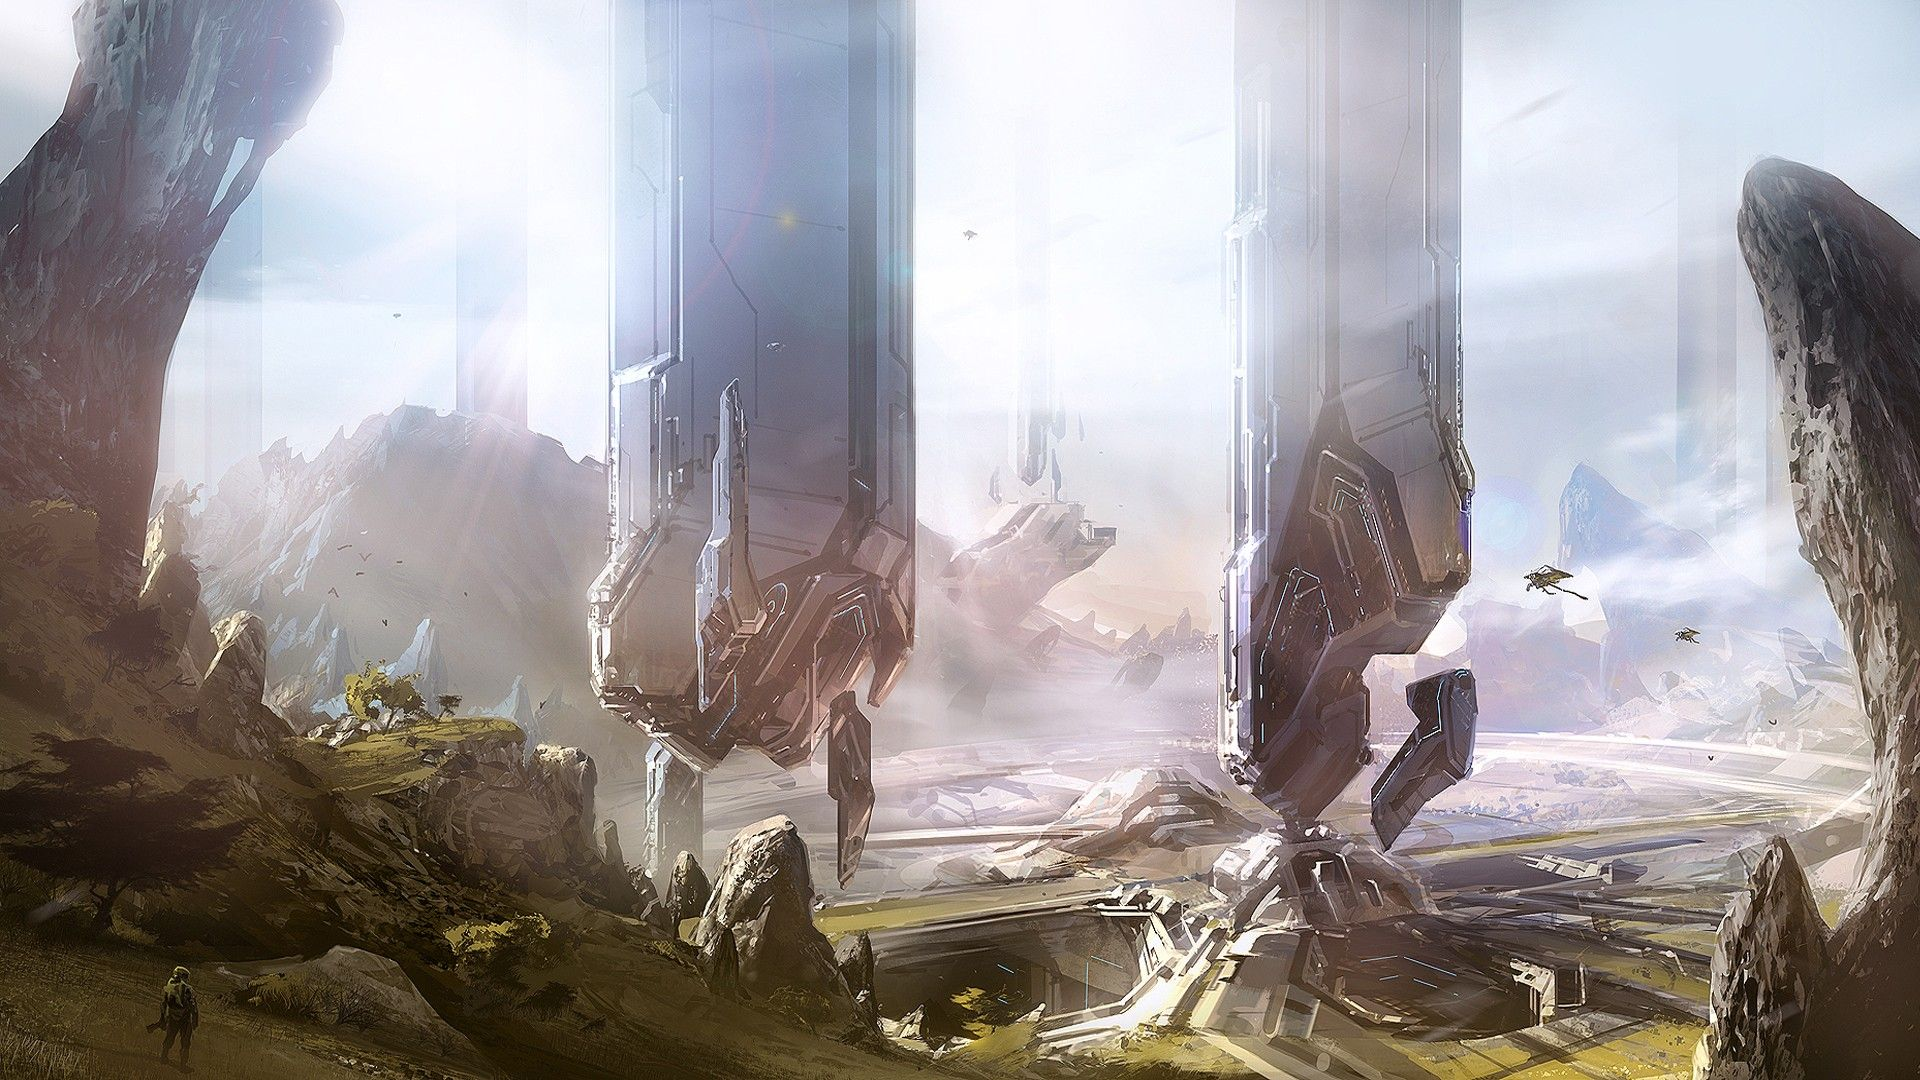 Halo Halo 4 Concept Art Video Games Wallpaper Concept Art Star Wars Concept Art Futuristic Art